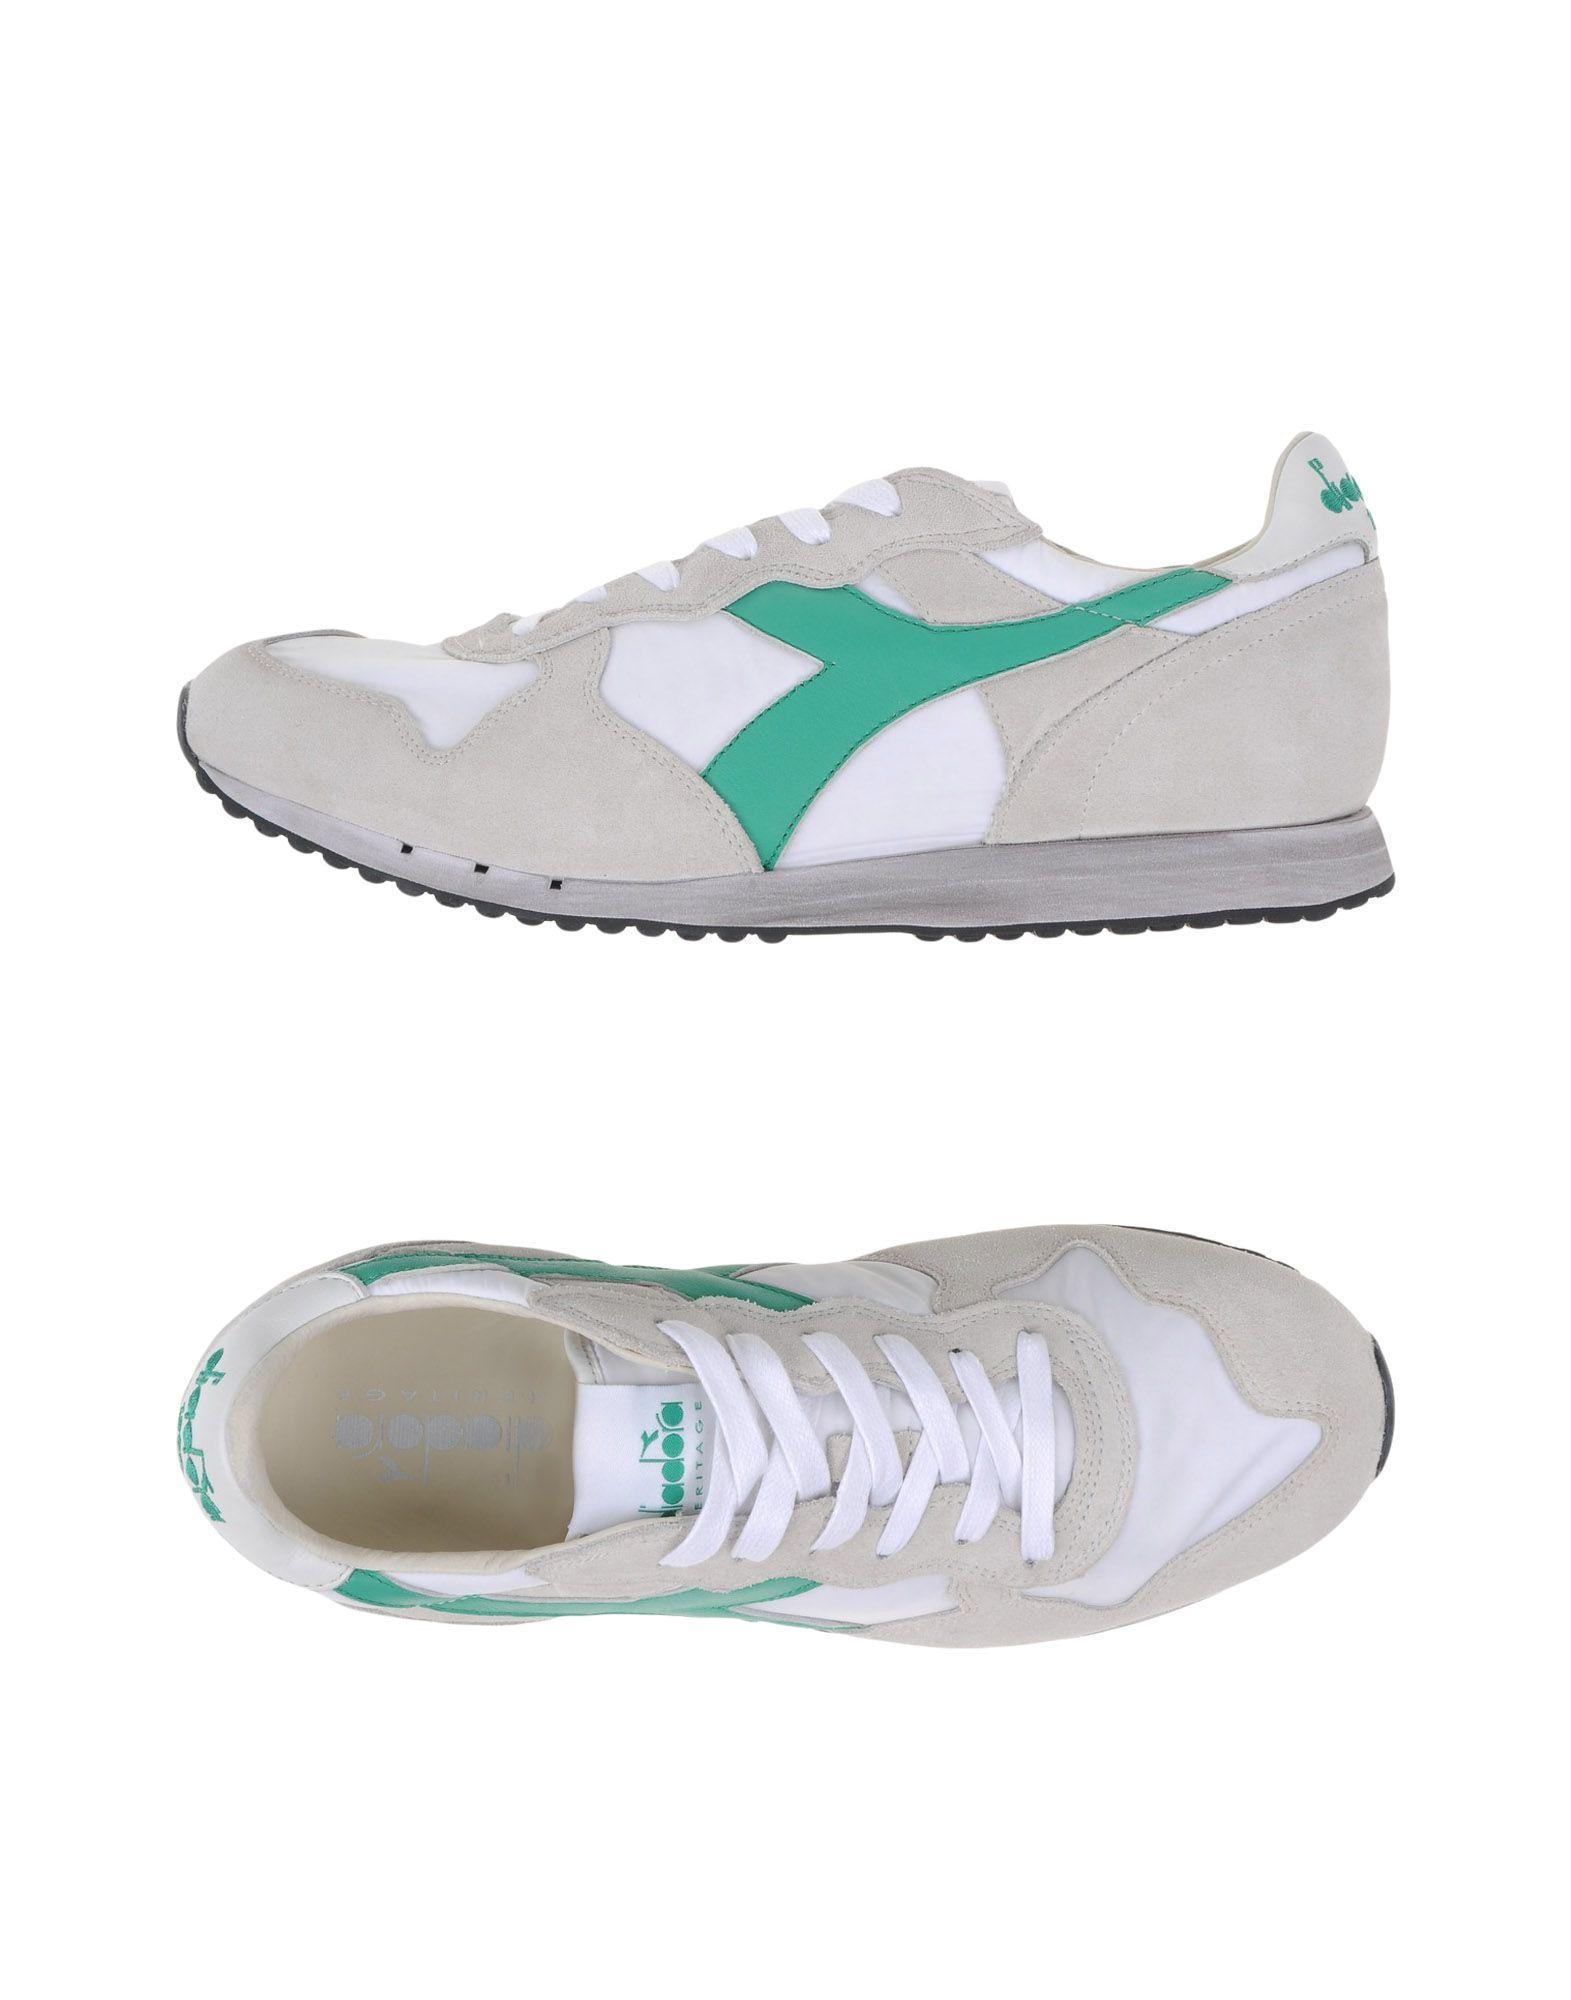 Sneakers Diadora Heritage Trident Nyl Sw - Uomo - Acquista online su